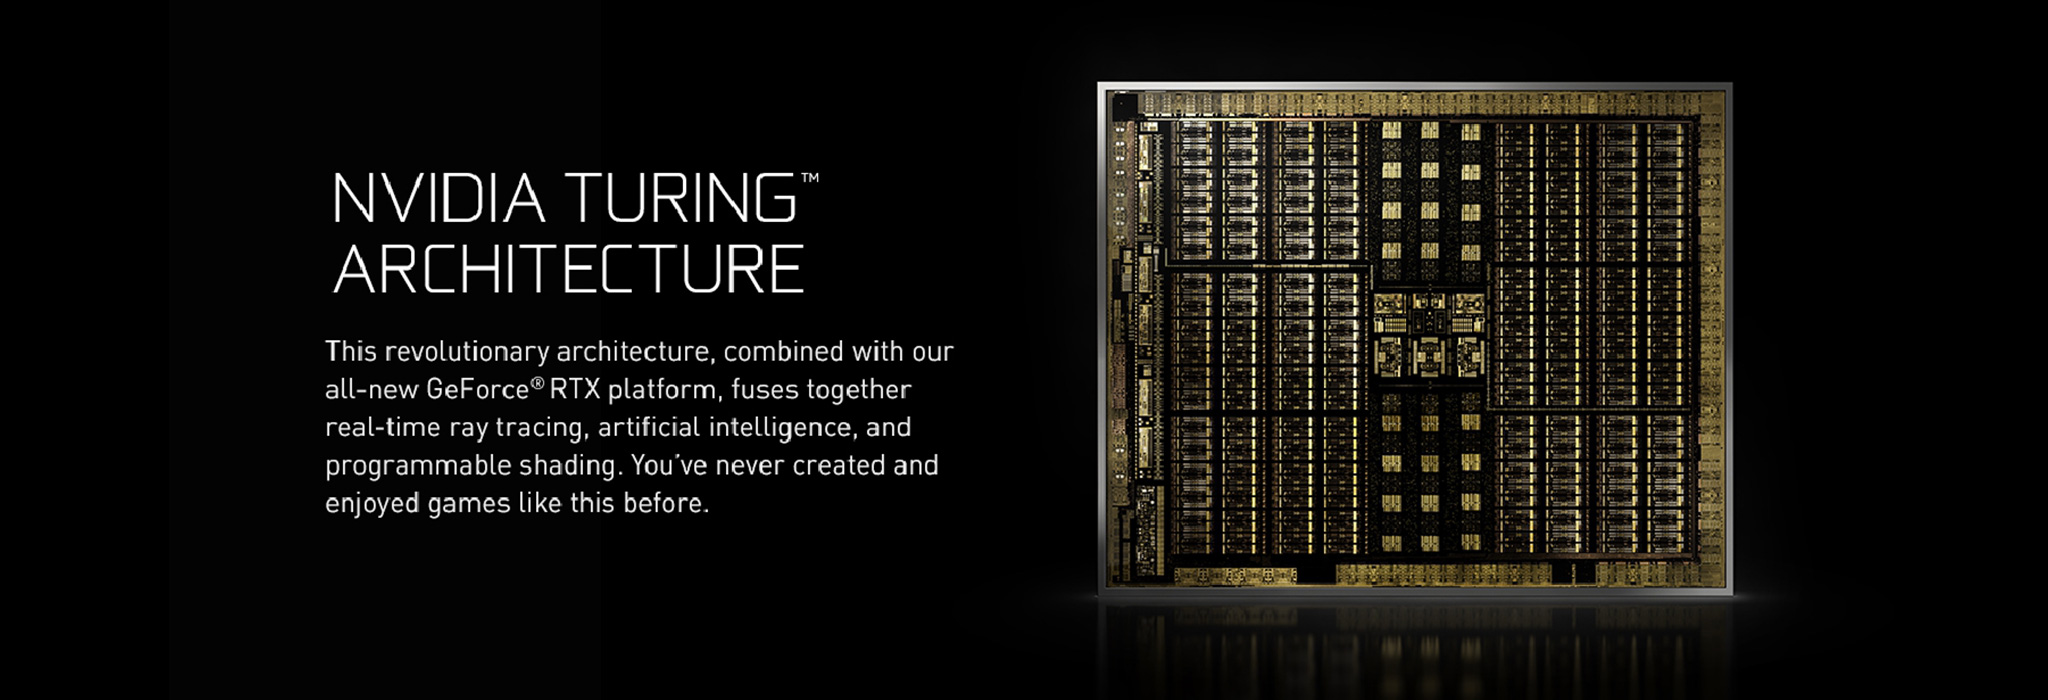 GeForce RTX™ 2070 GAMING 8G | Graphics Card - GIGABYTE Global